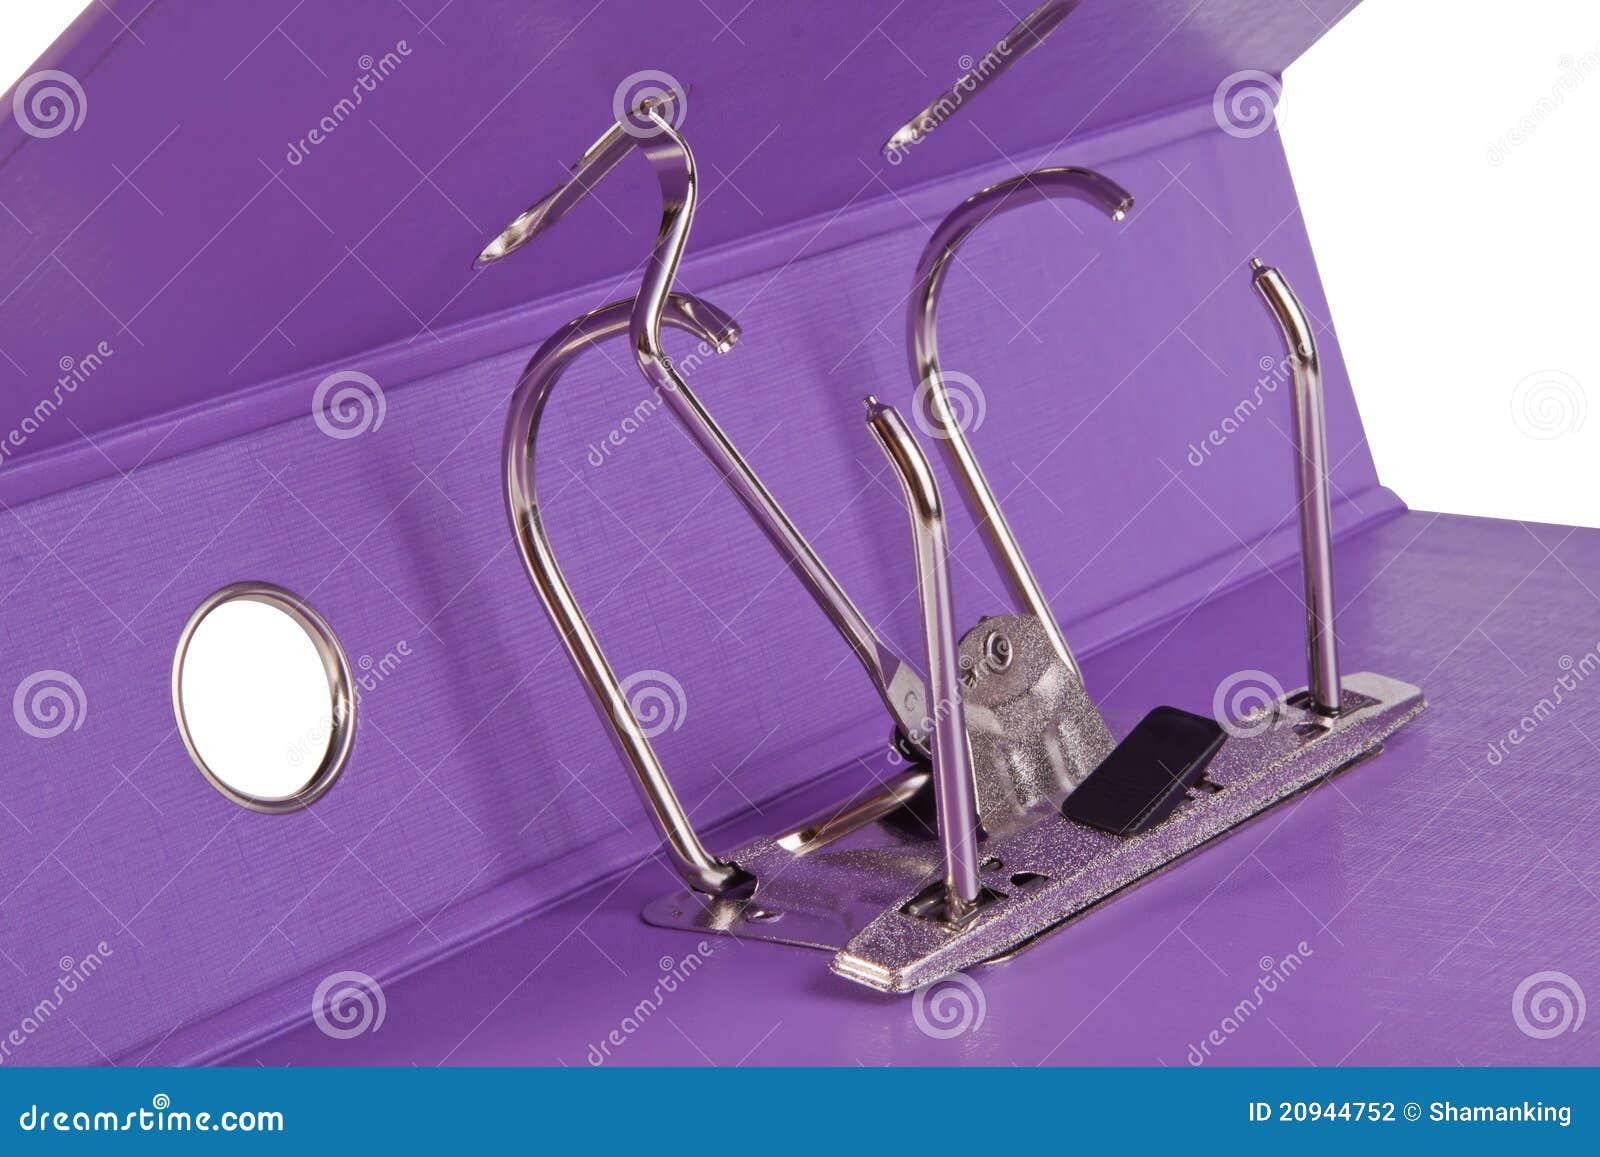 Mechanism registrar stock photo  Image of binder, mechanism